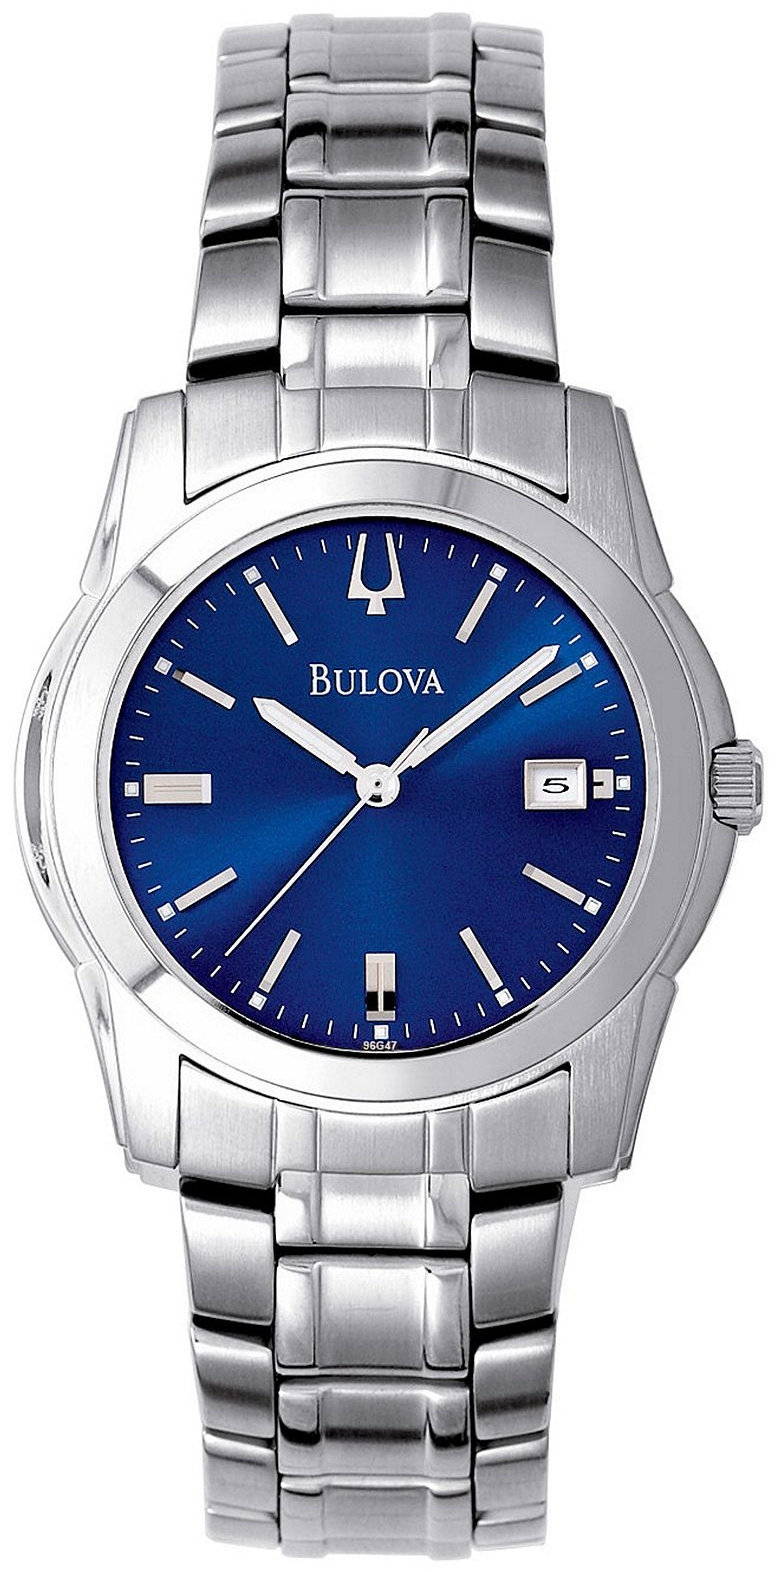 Bulova Men's Stainless Watch 40mm